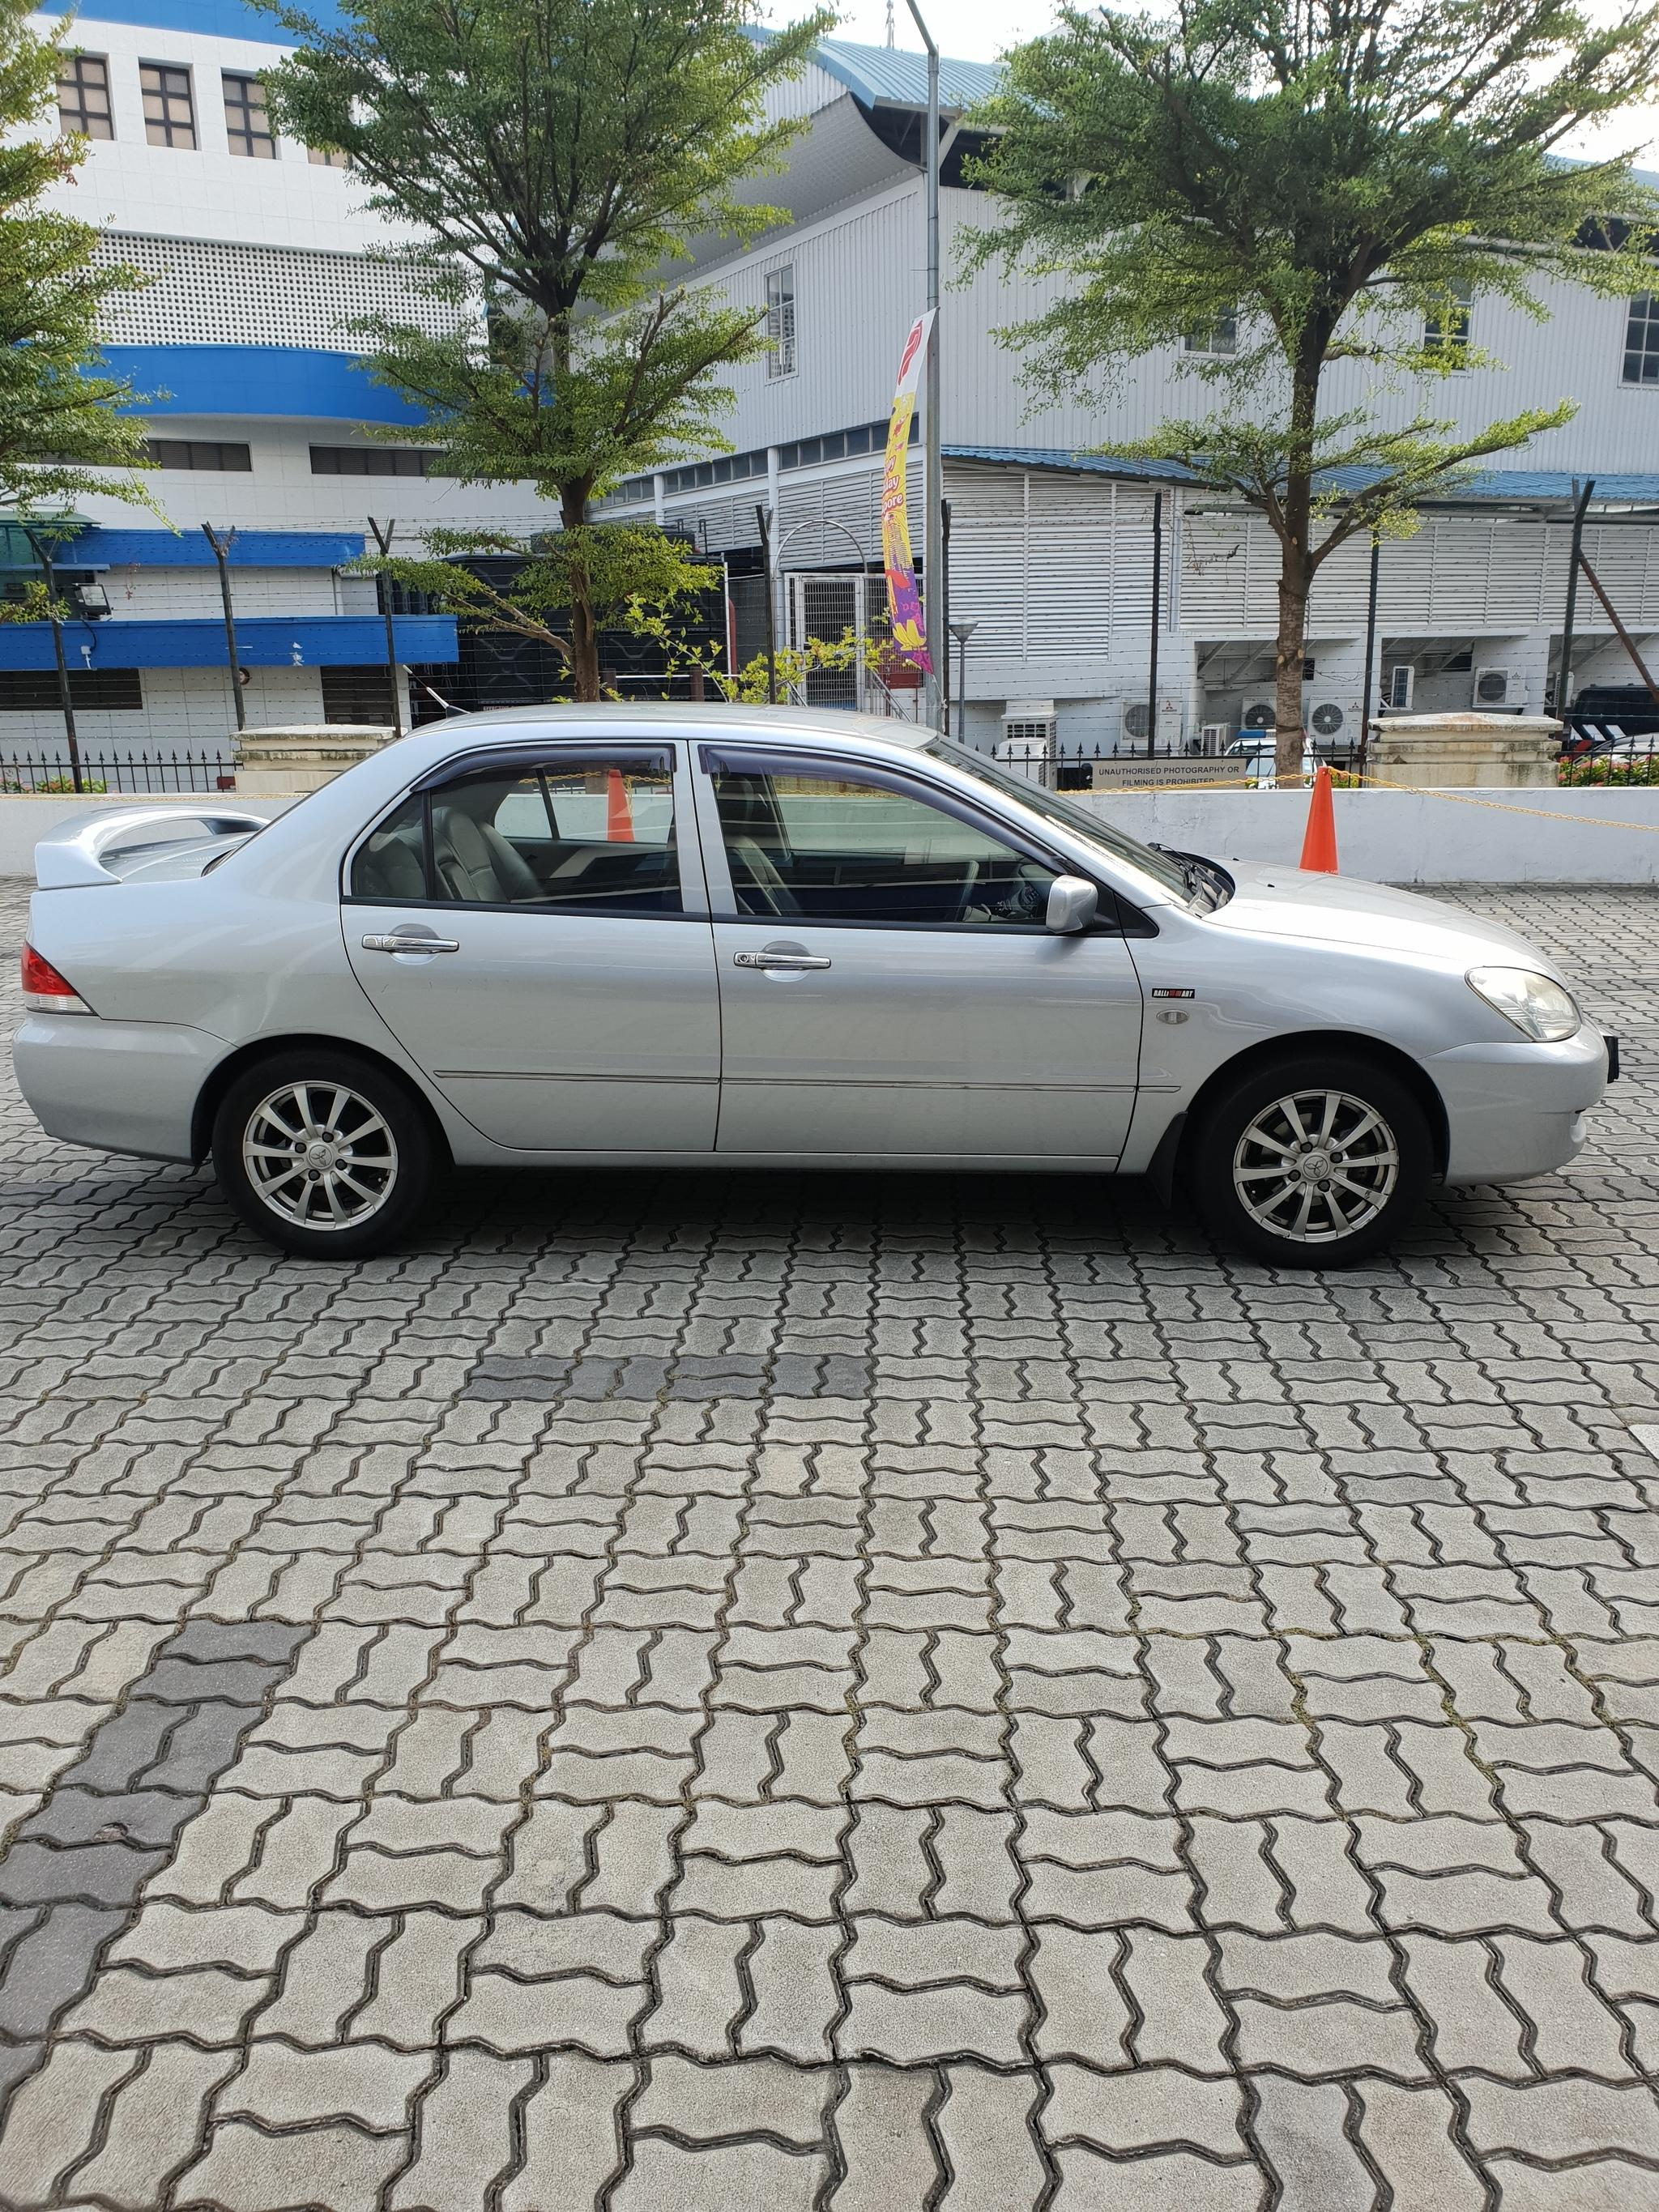 Mitsubishi Lancer GLX 1.6A Cheap Car Rental for Grab GoJek Ryde or Personal use